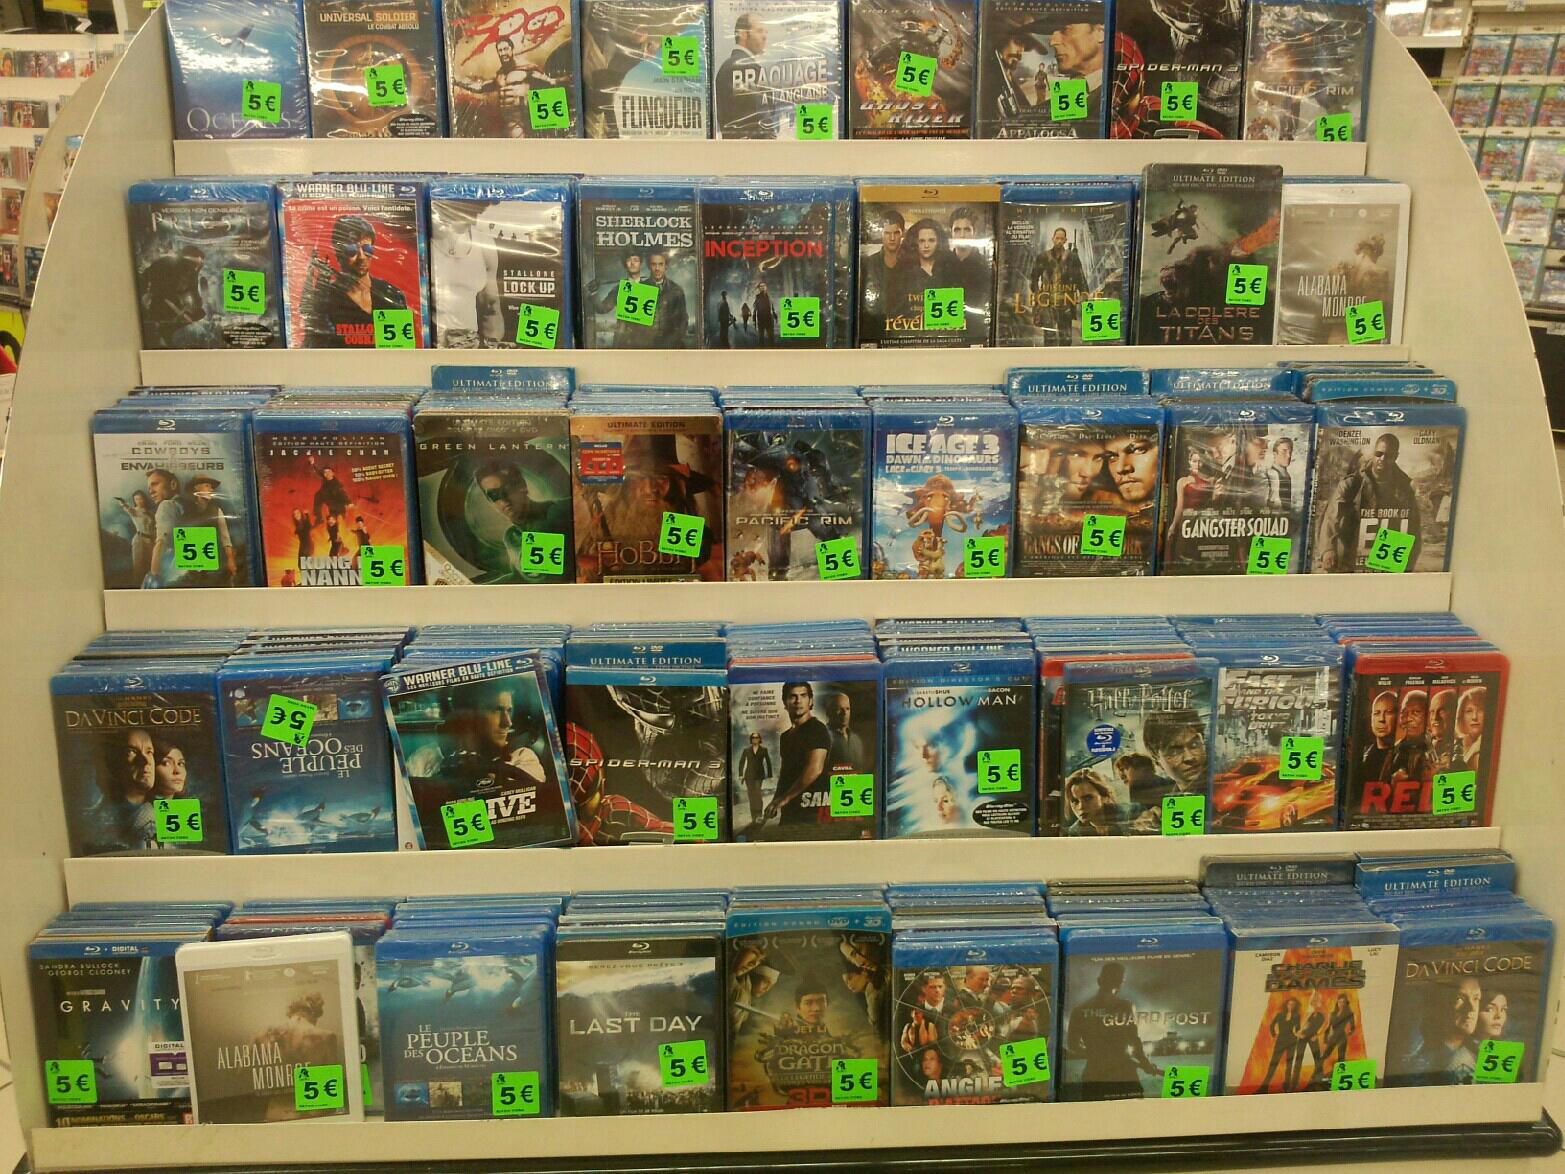 Grande sélection de films Blu-Ray (Gravity, Ice Age 3, Da Vinci Code, Oceans...)